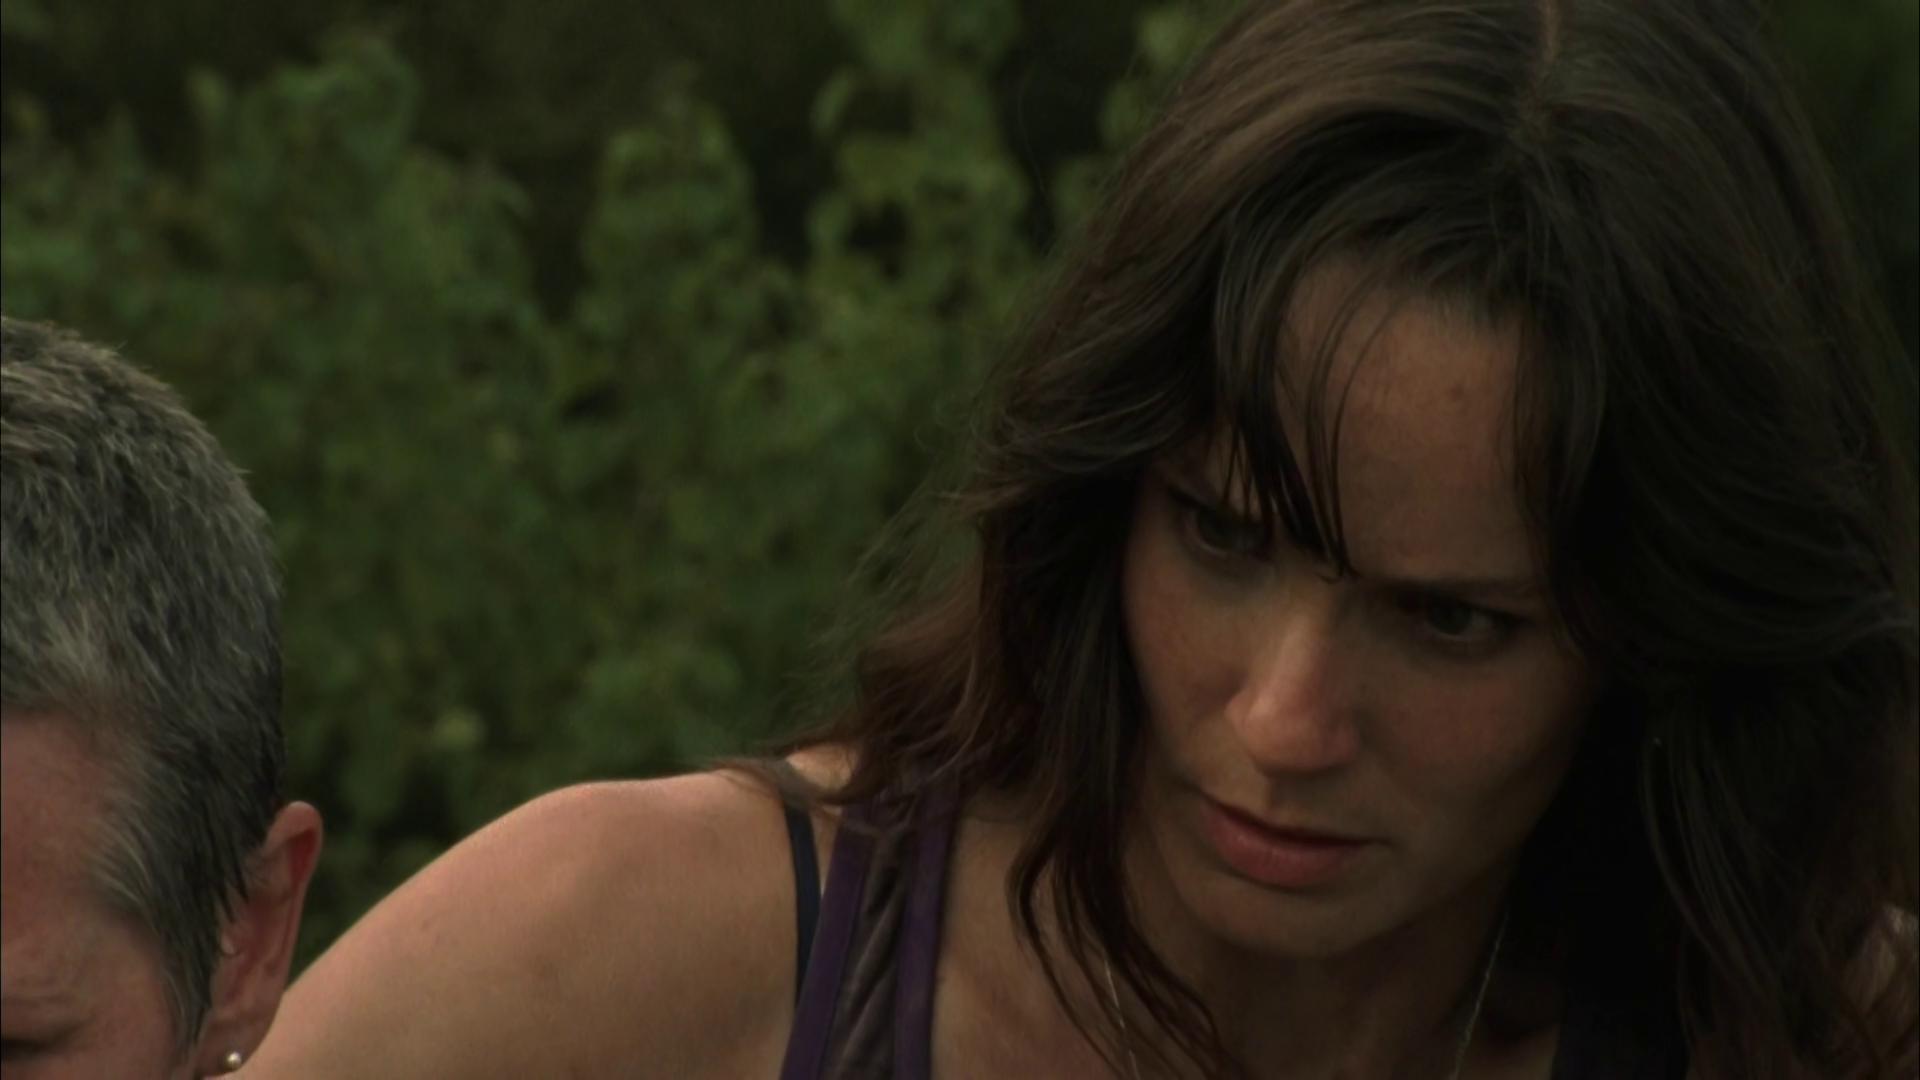 The Walking Dead - Stagione 2 (2012) (Completa) BDRip 1080P HEVC ITA ENG DD5.1 x265 mkv Vlcsnap-2019-01-23-21b1kdk